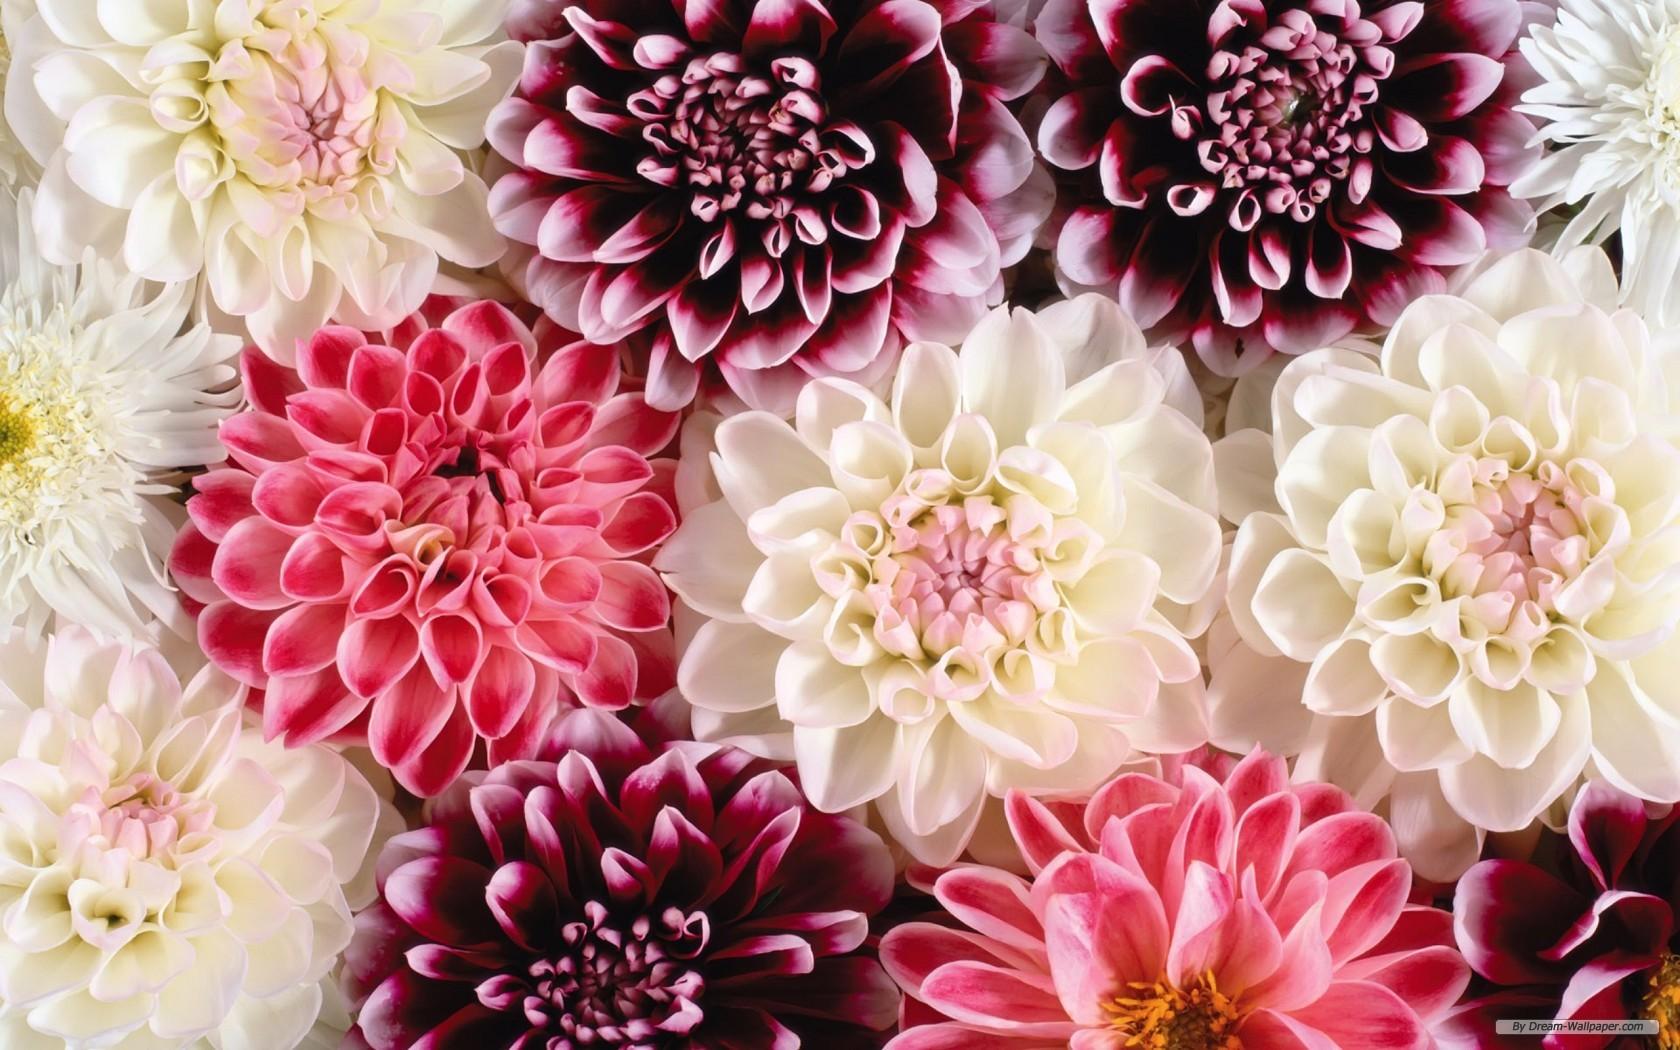 Beautiful flower wallpaper 17 widescreen wallpaper beautiful flower wallpaper 17 widescreen wallpaper izmirmasajfo